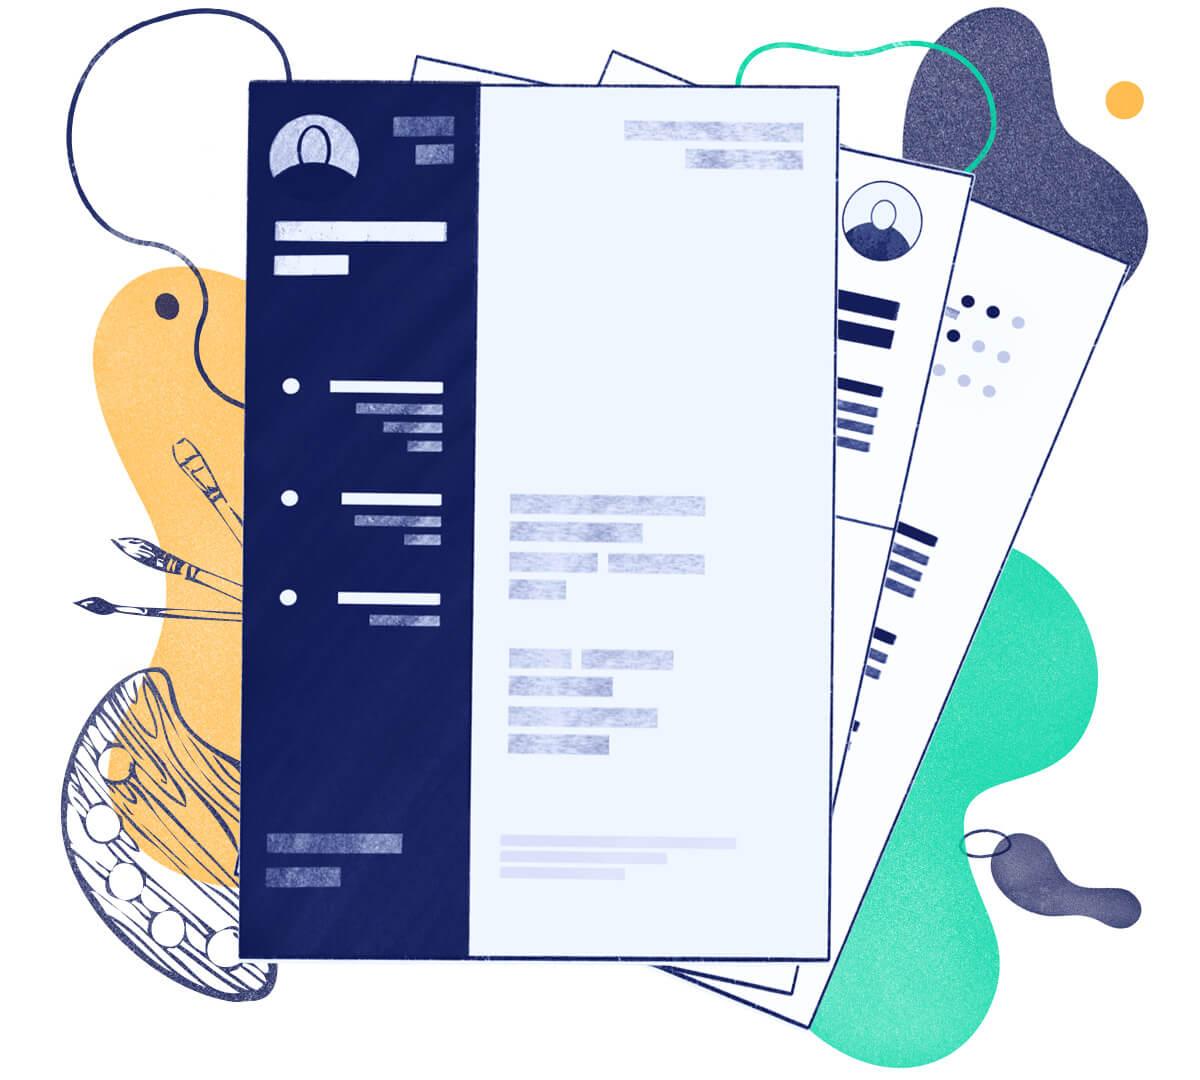 Artist CV/Artist CV Sample—Examples and Writing Tips